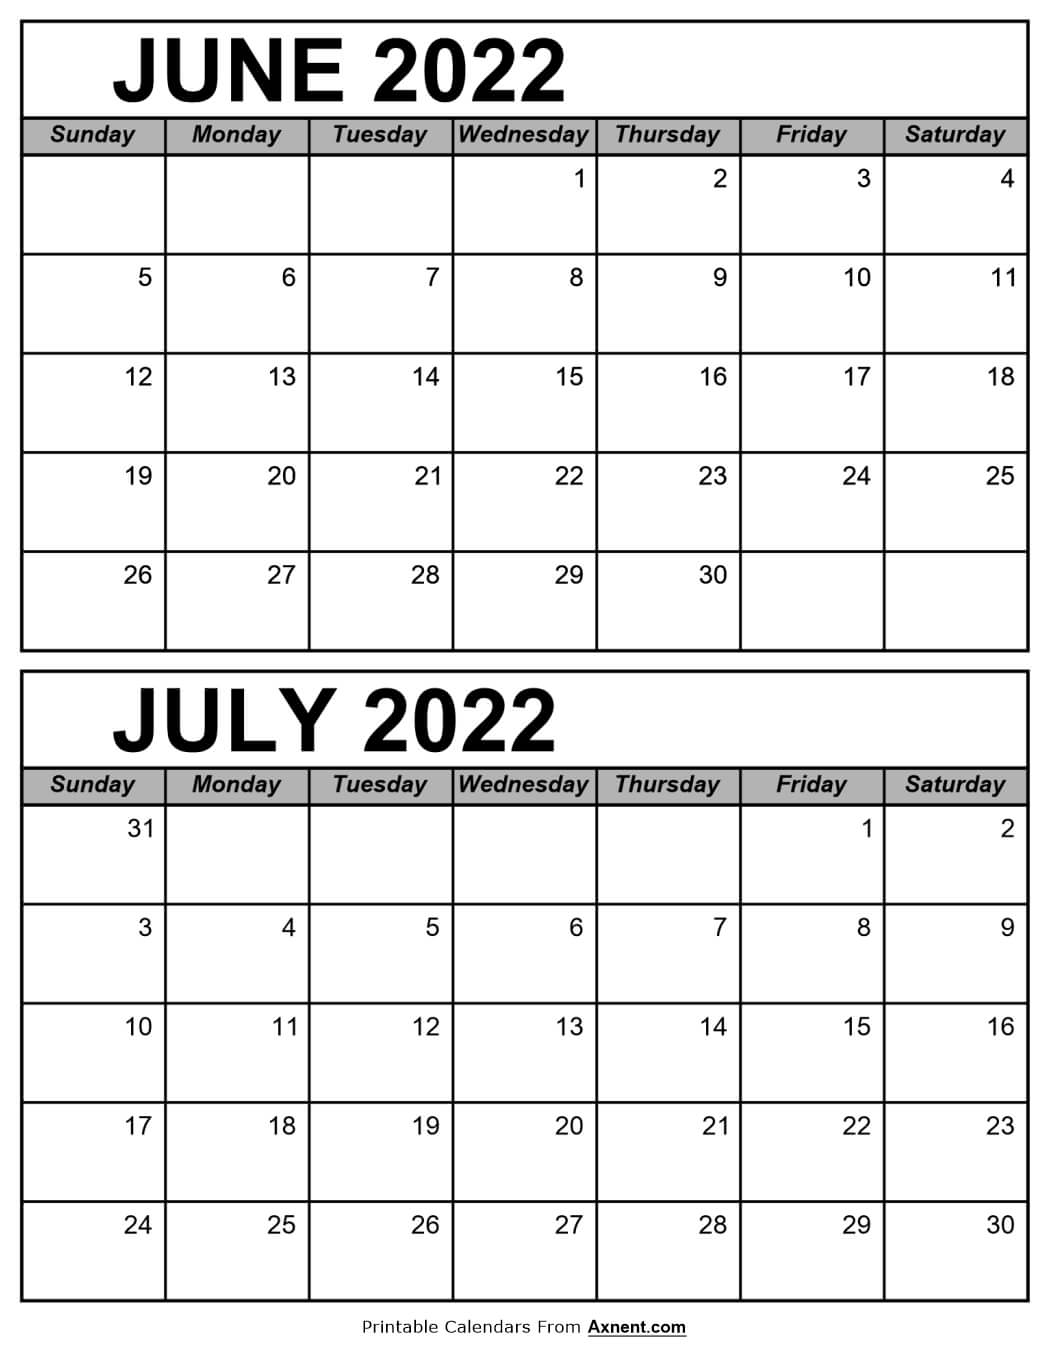 Calendar June and July 2022